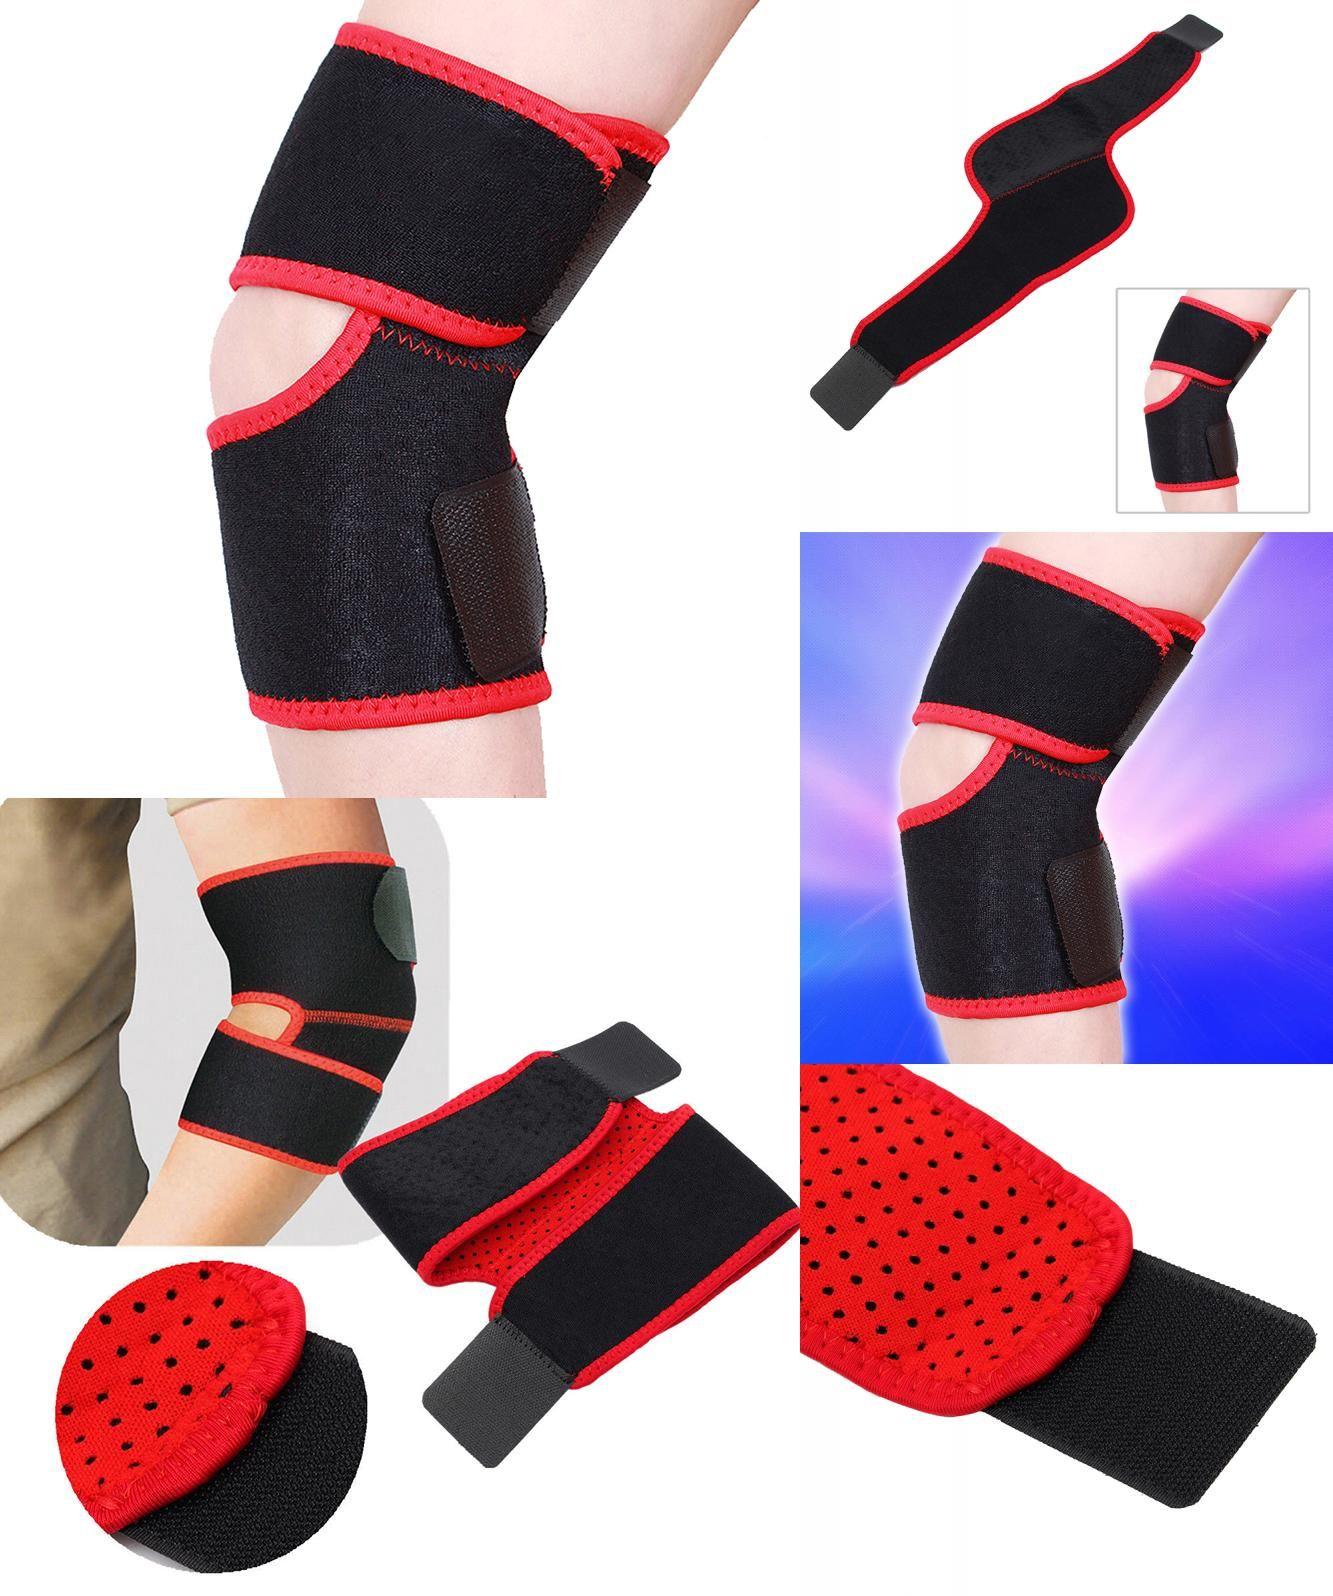 98c7de2e03 [Visit to Buy] Ajustable Elbow Knee Support Brace relief elbow pain Strong  Sports Badminton